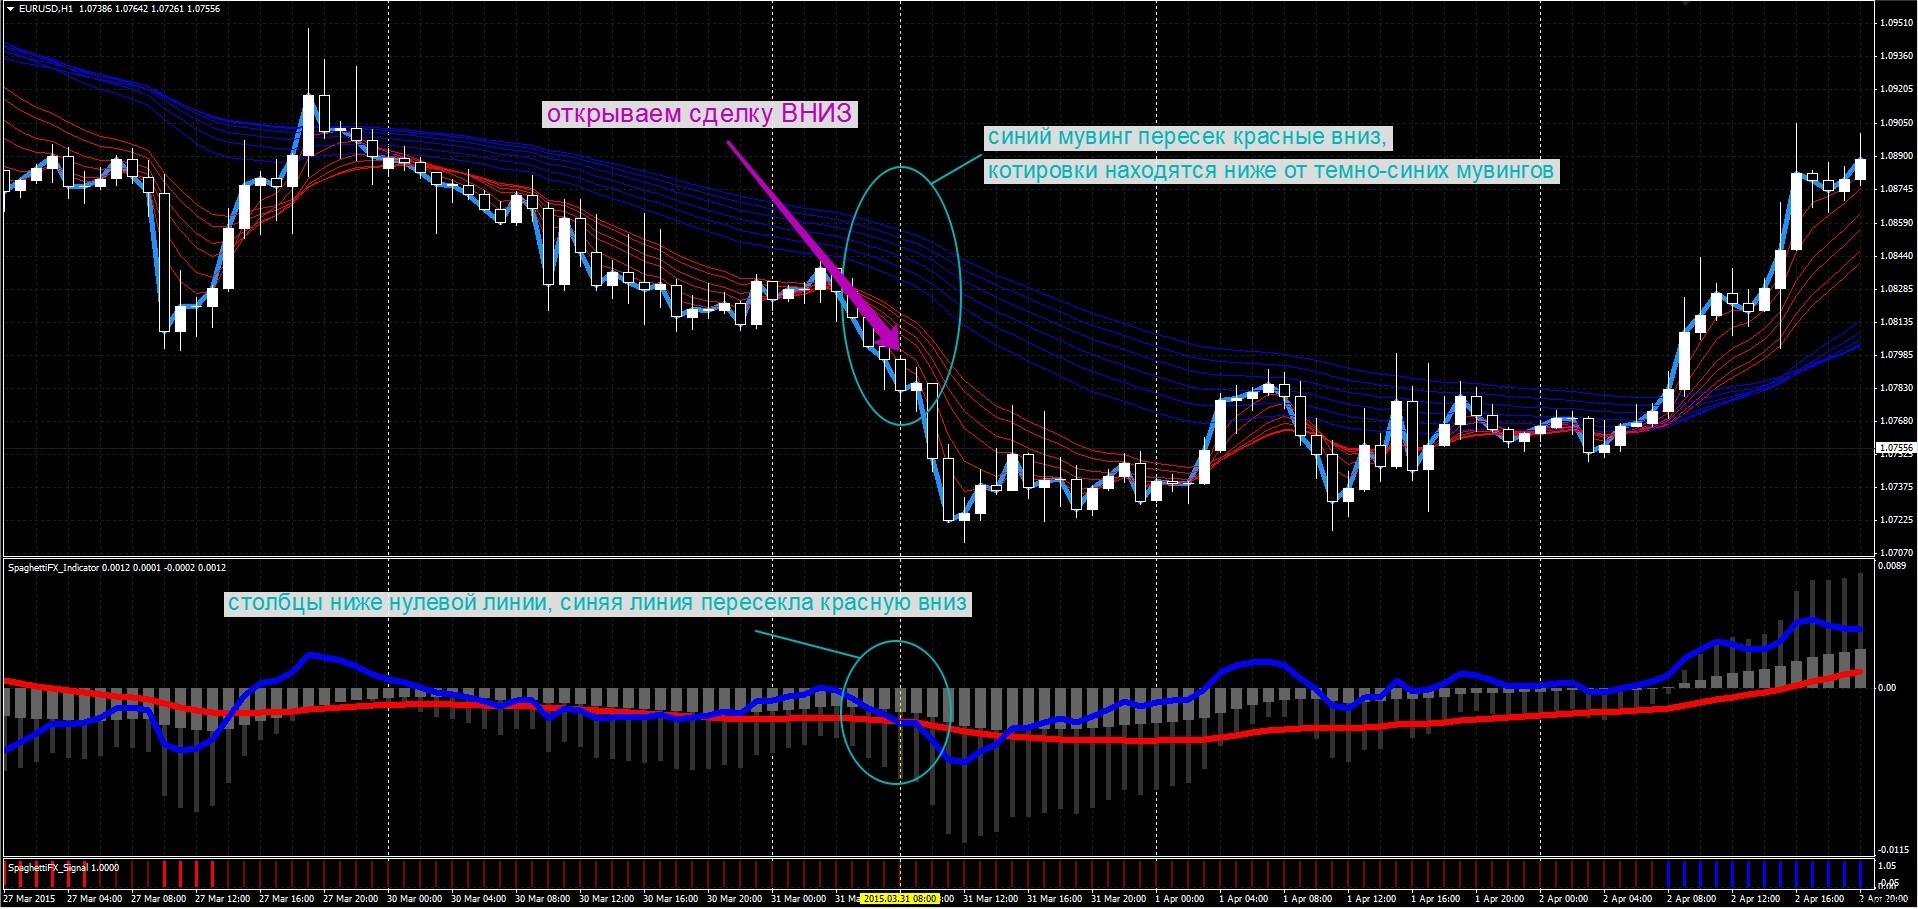 Торговля опционами по системе - Спагетти